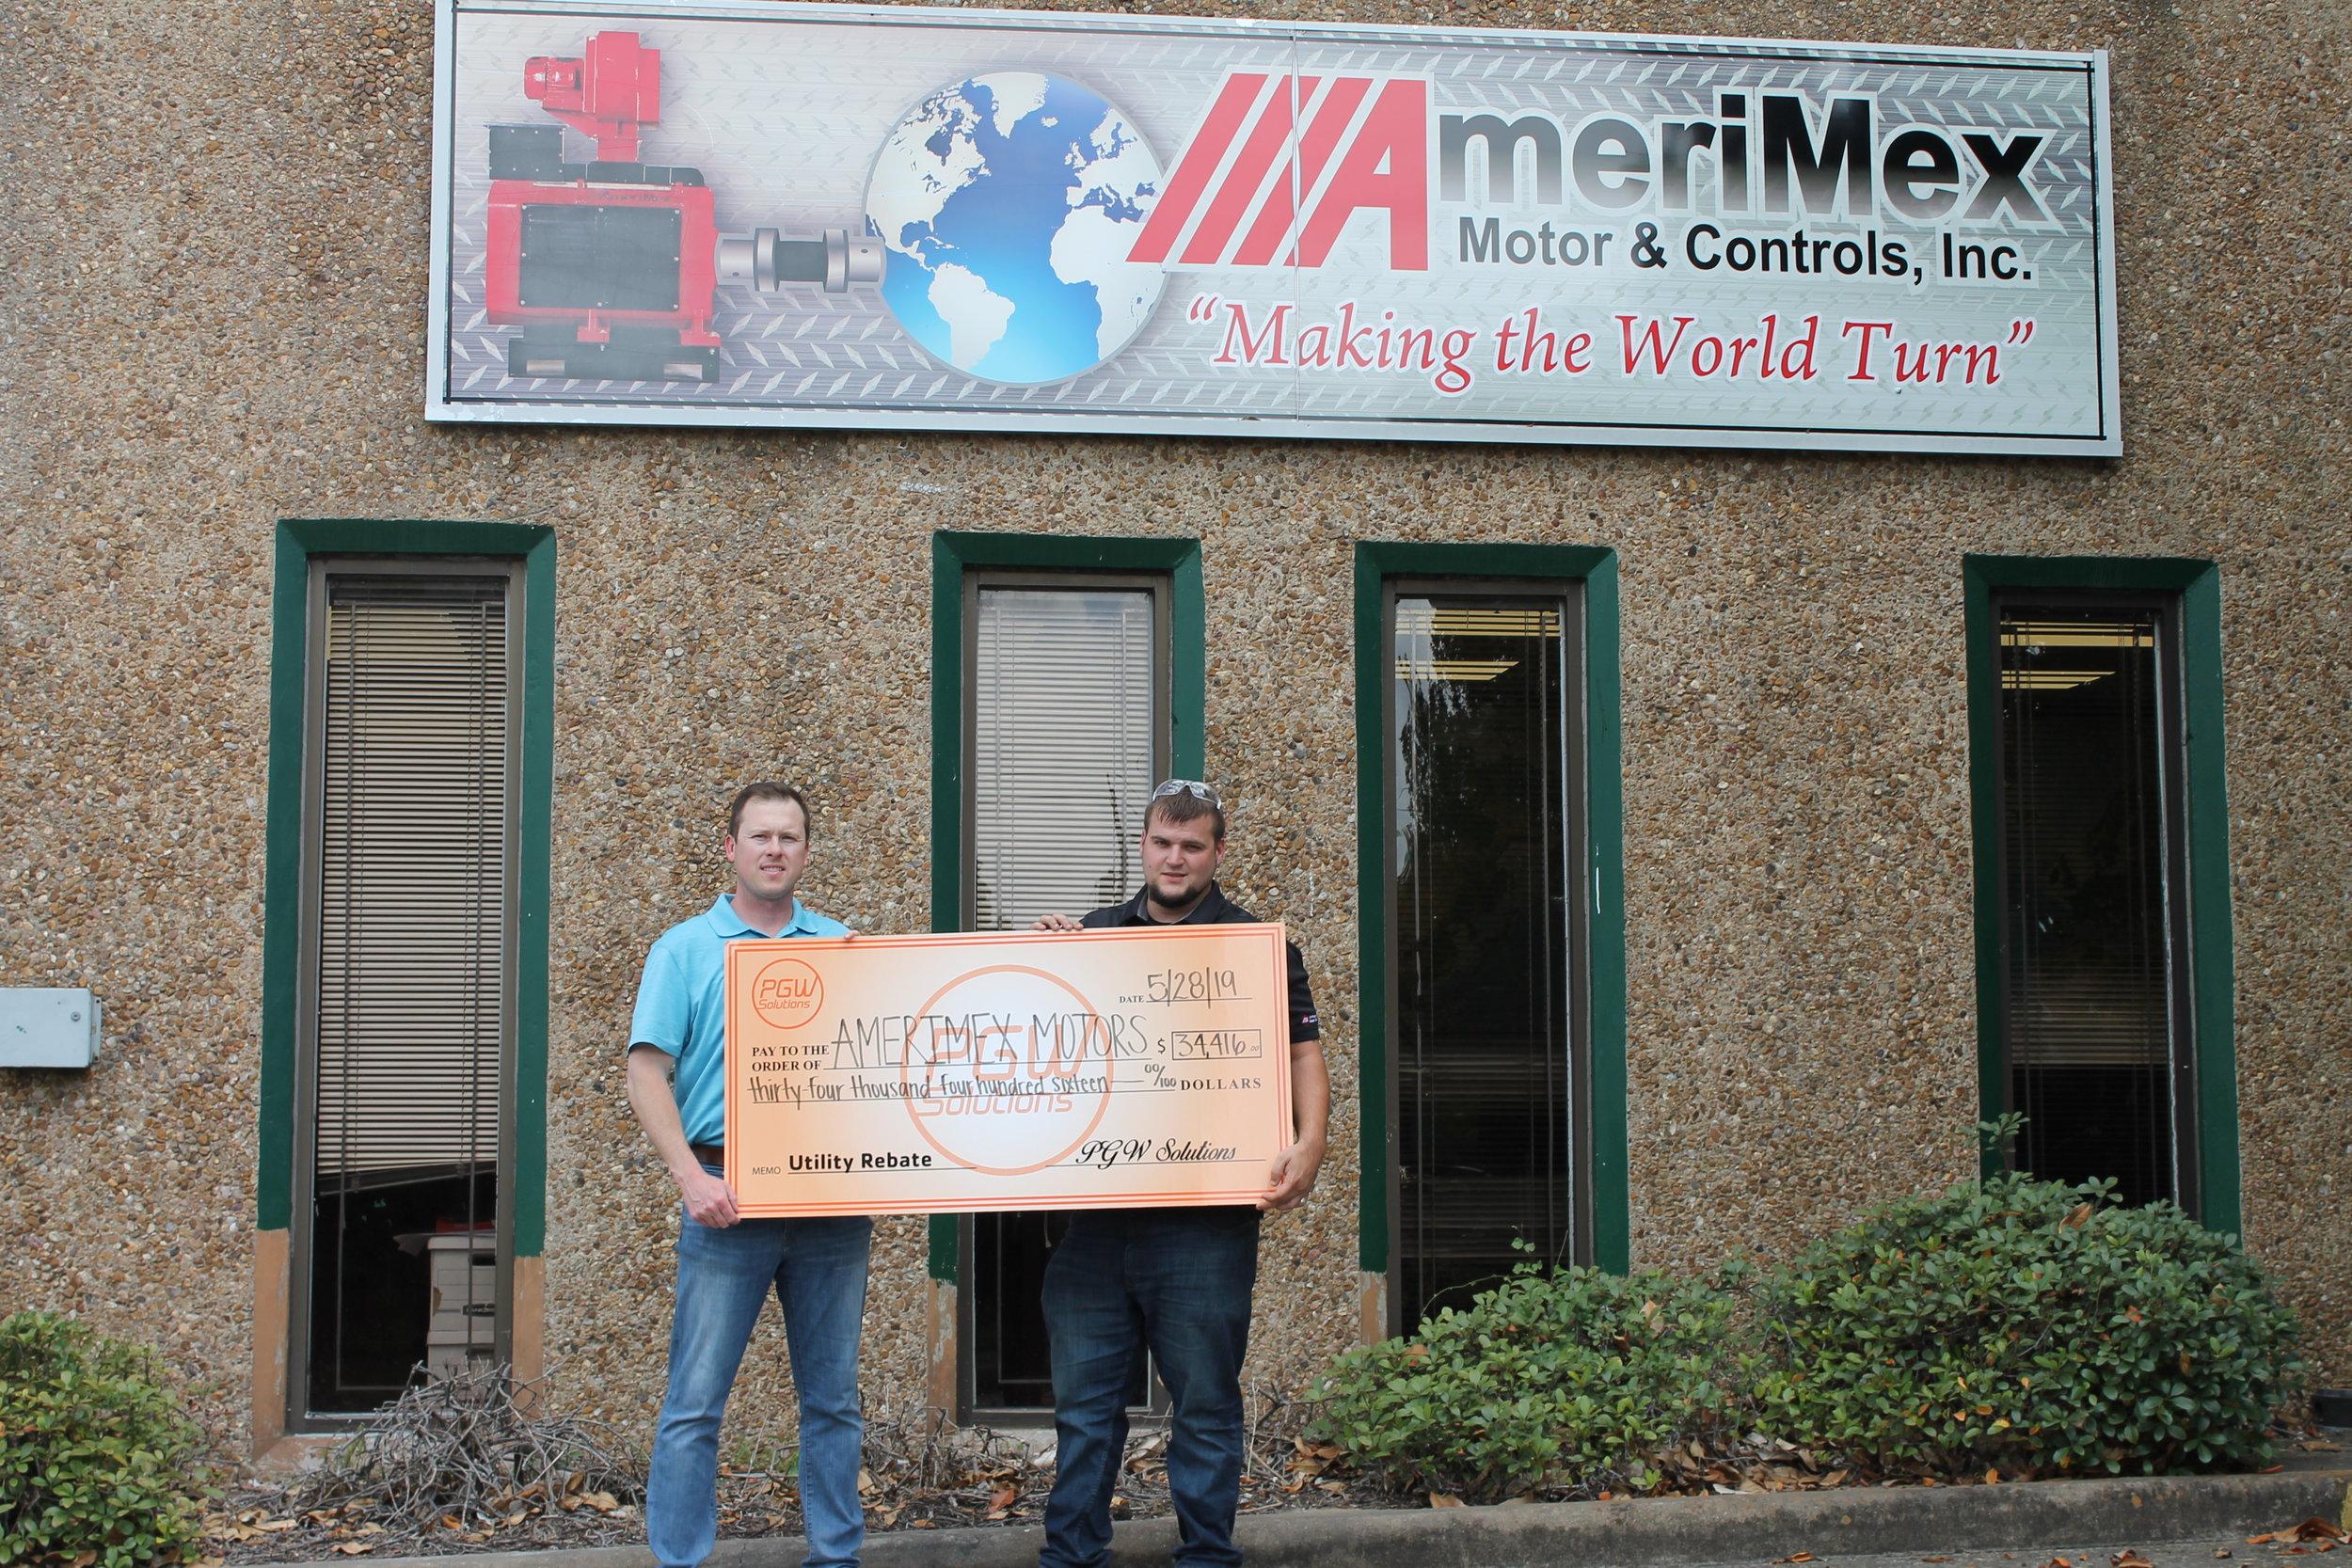 AmeriMex Motor & Controls, Inc. -  $34,416